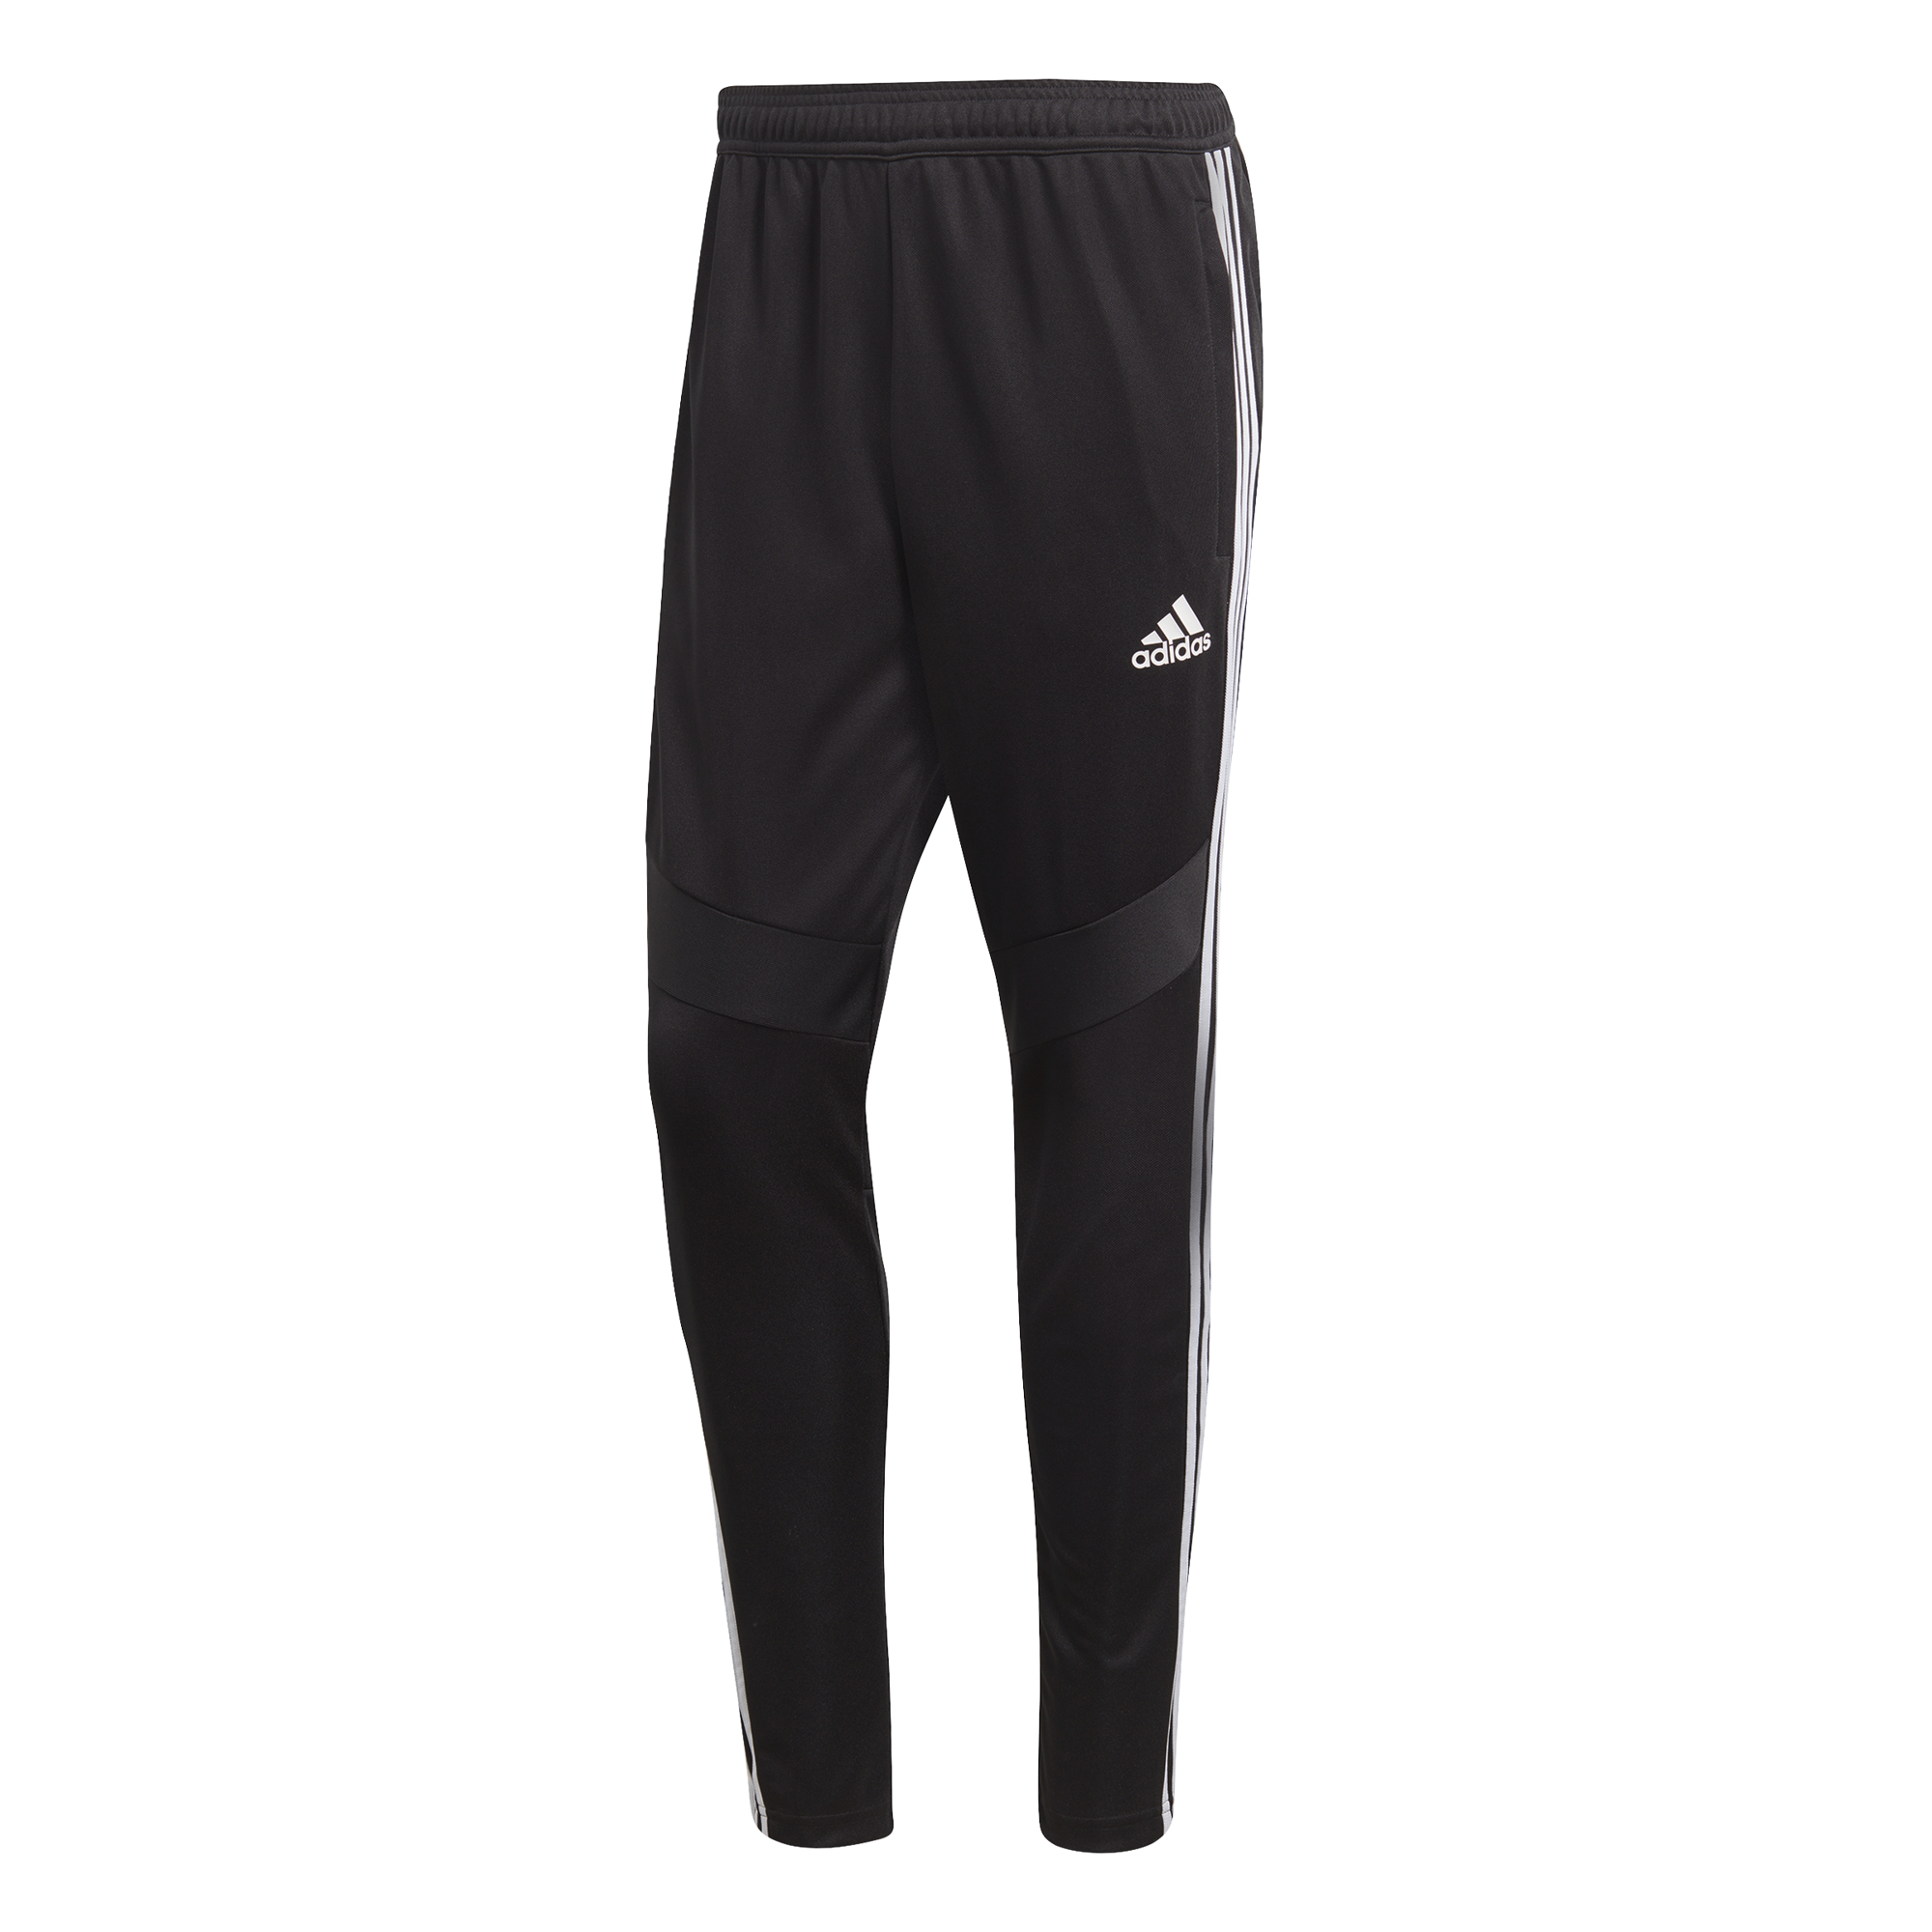 ADIDAS tréninkové kalhoty Tiro 19